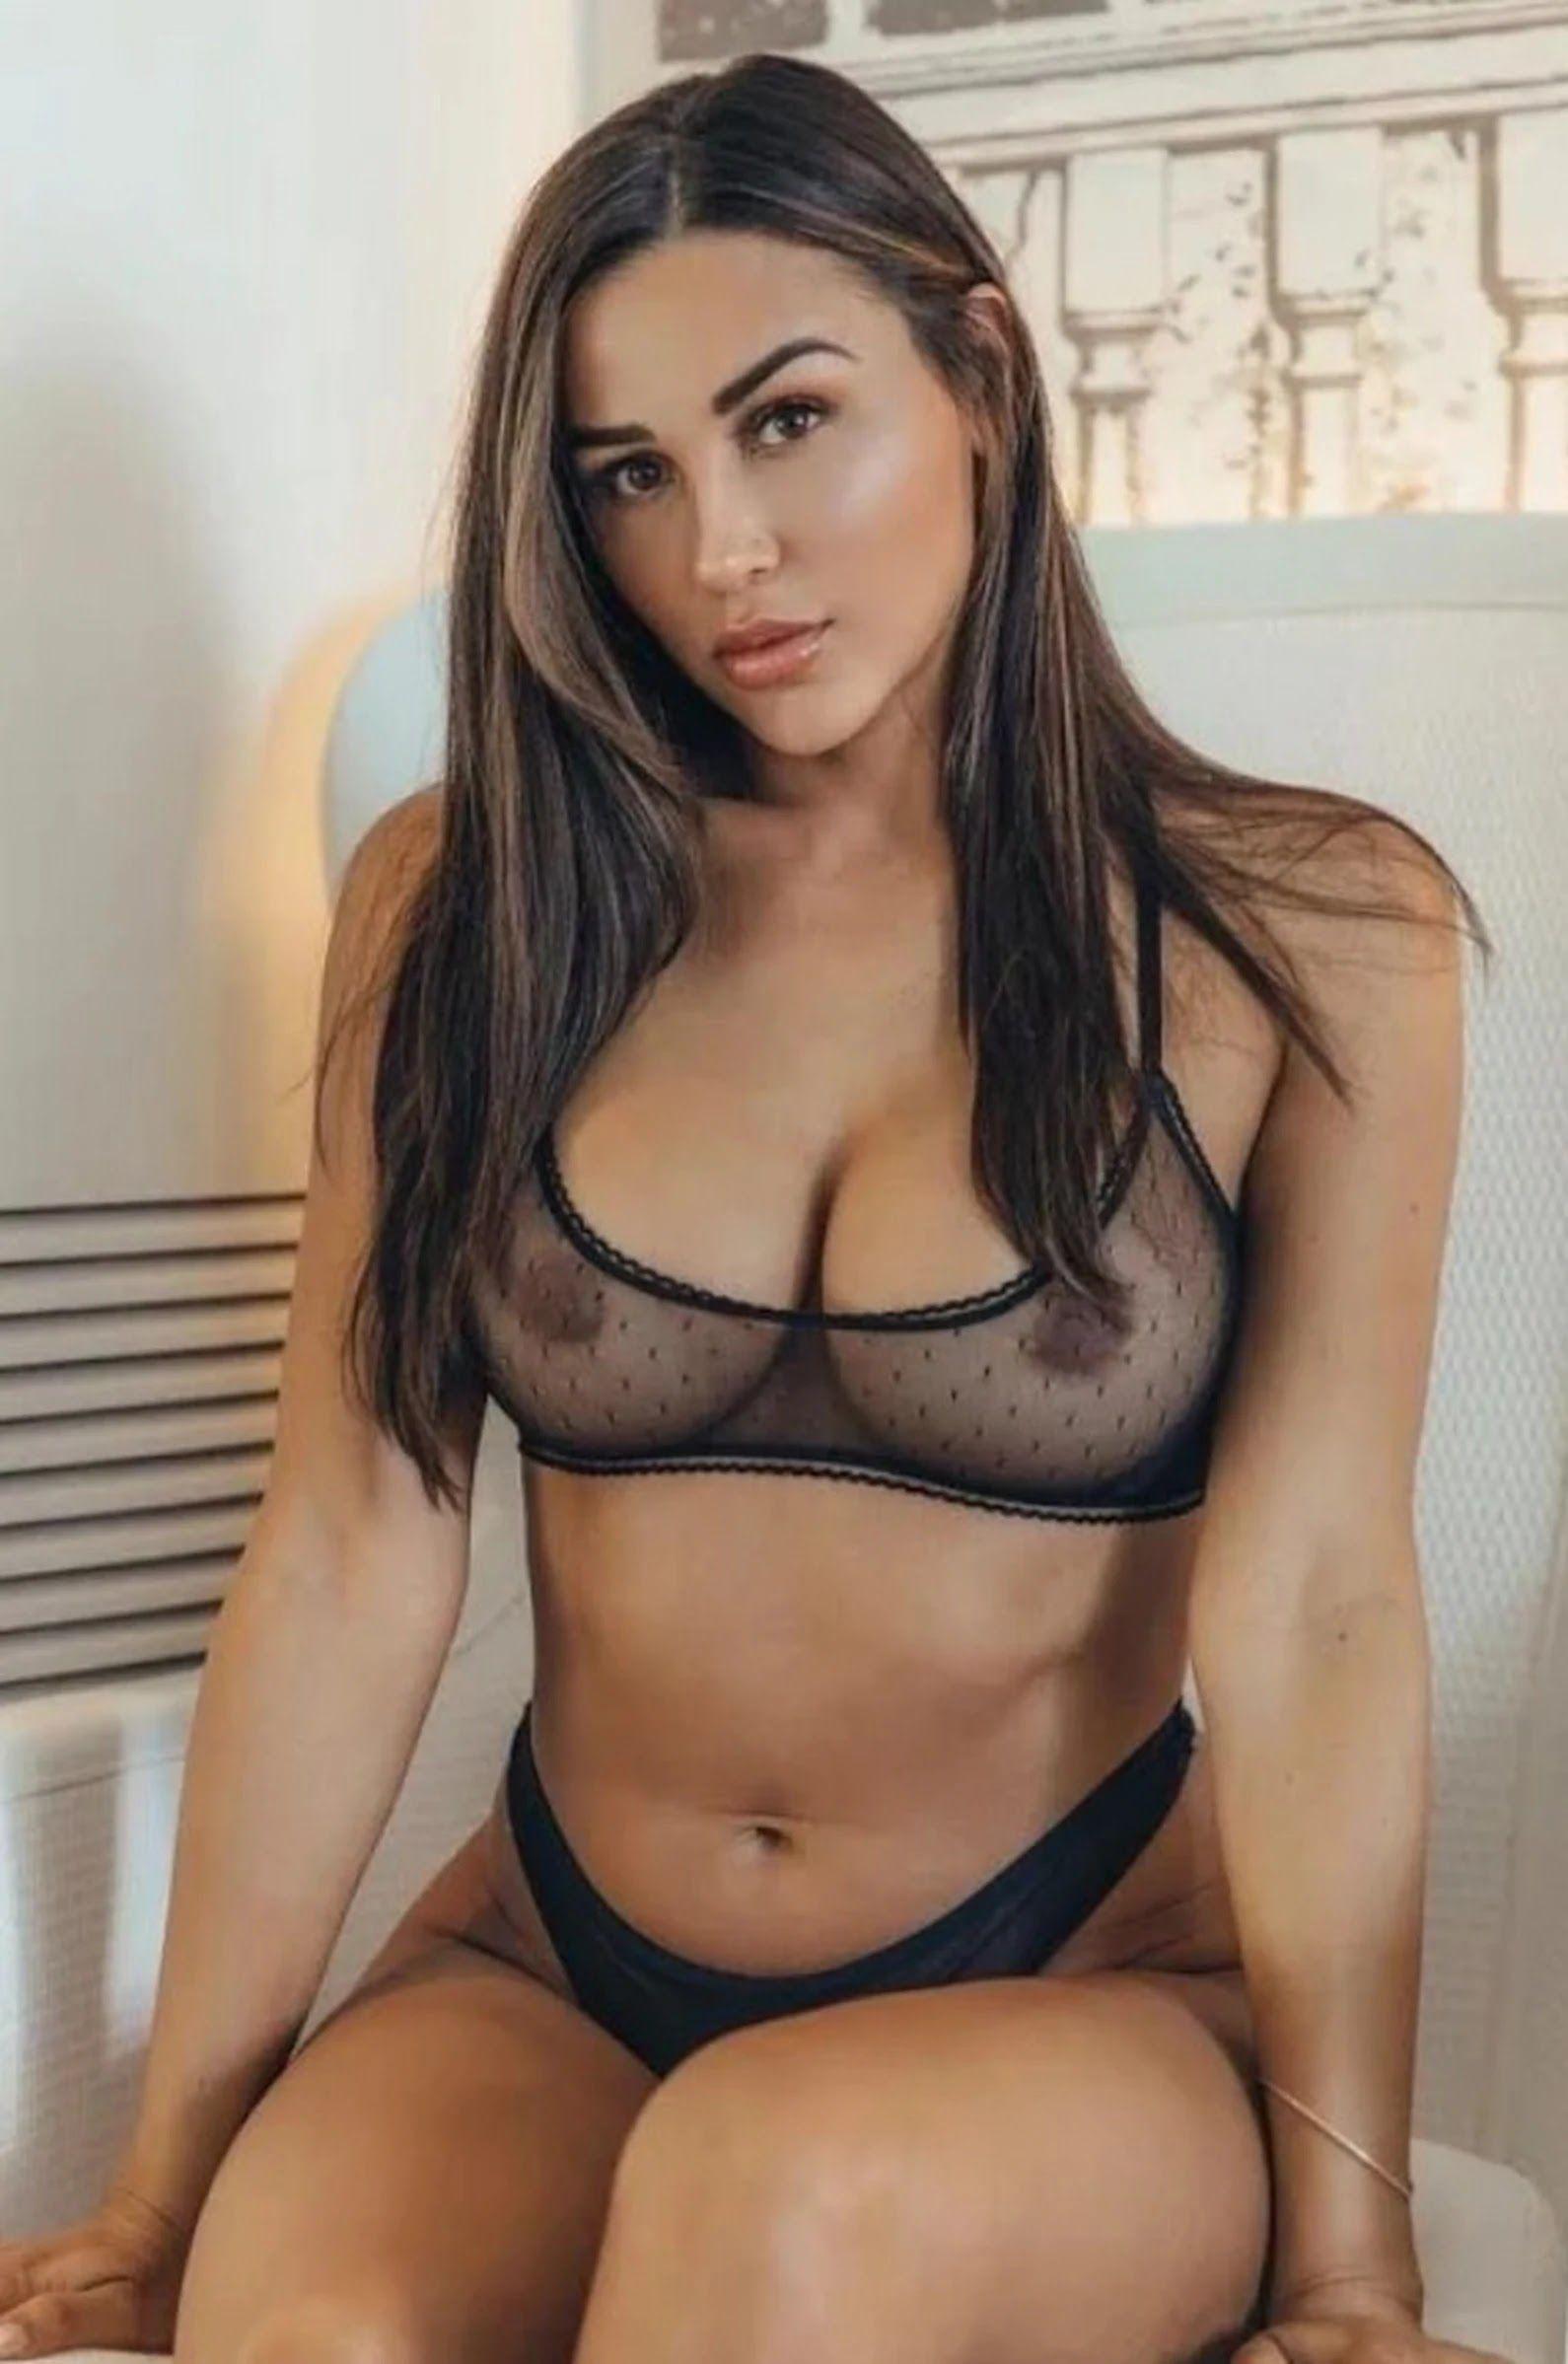 050b566ba SiSsOuFuN - Belles et sexy en lingerie